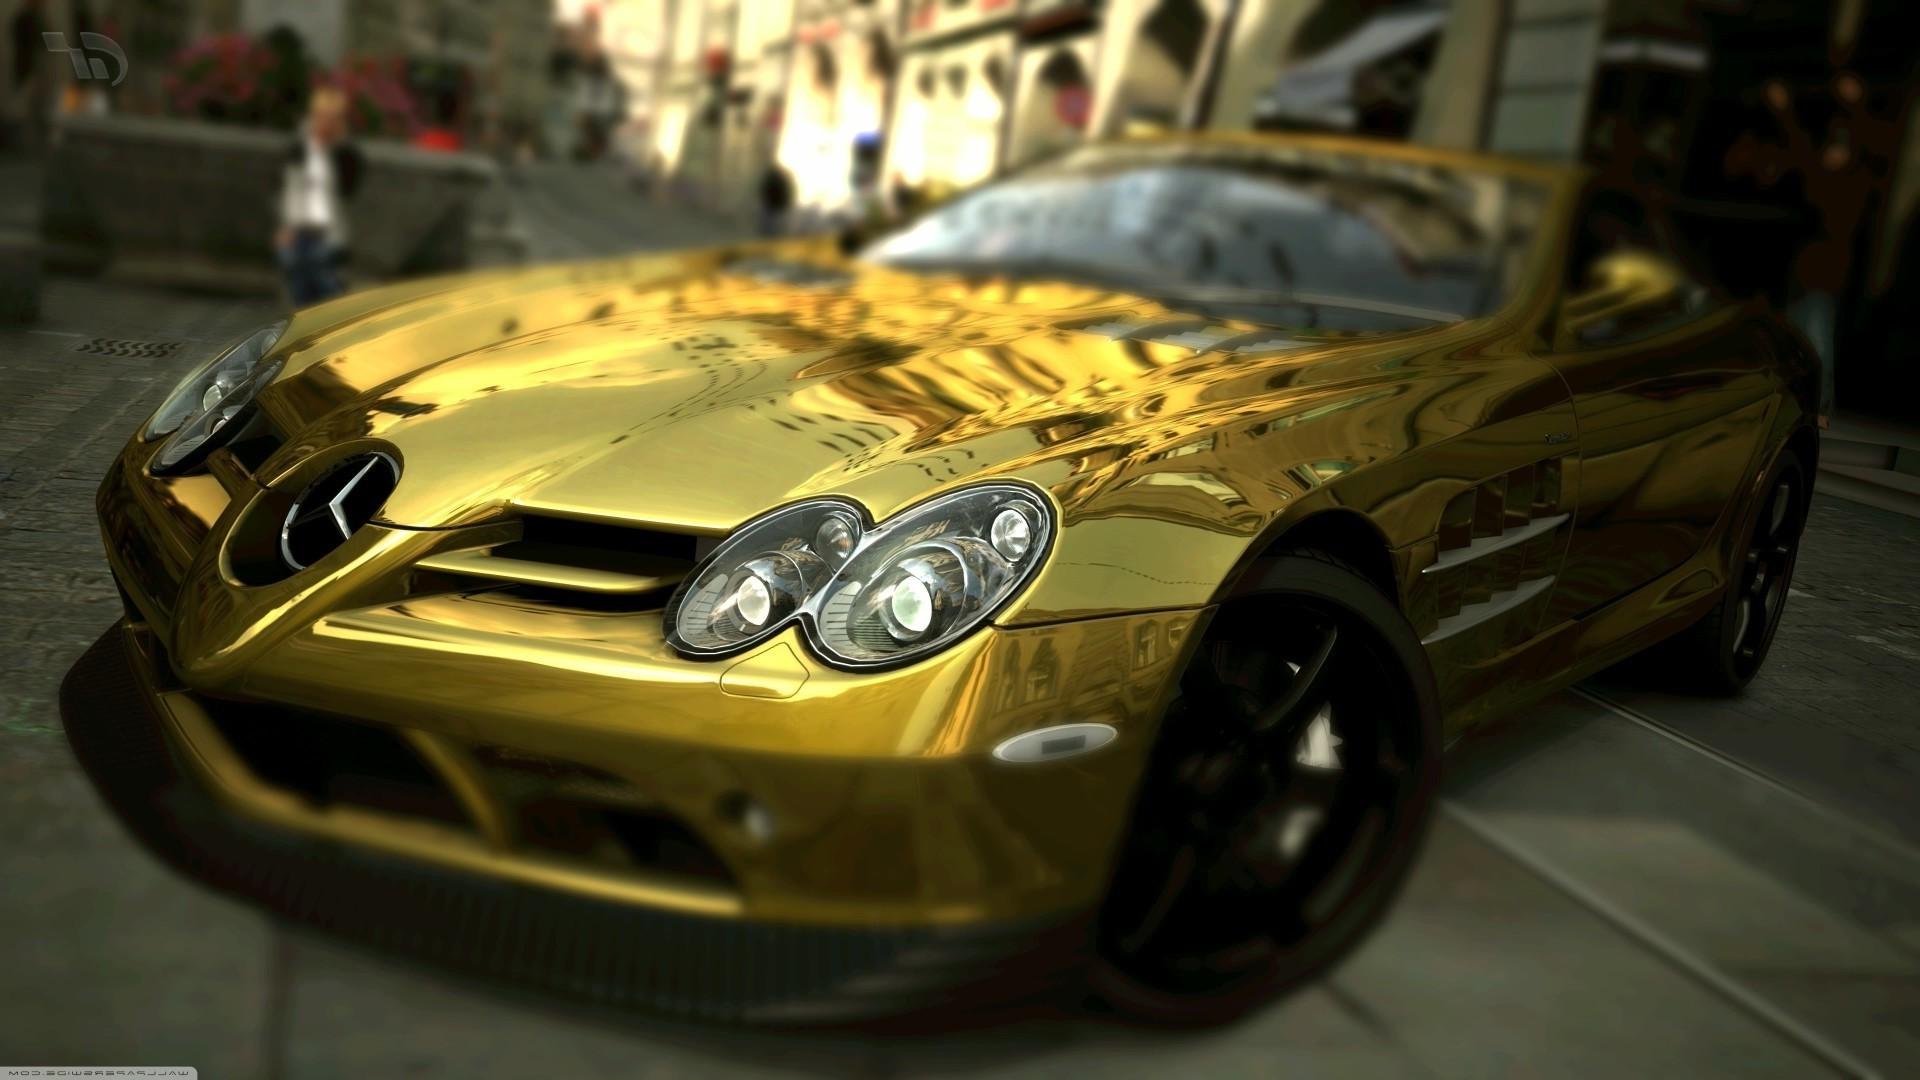 Mercedes-benz - Phone wallpapers